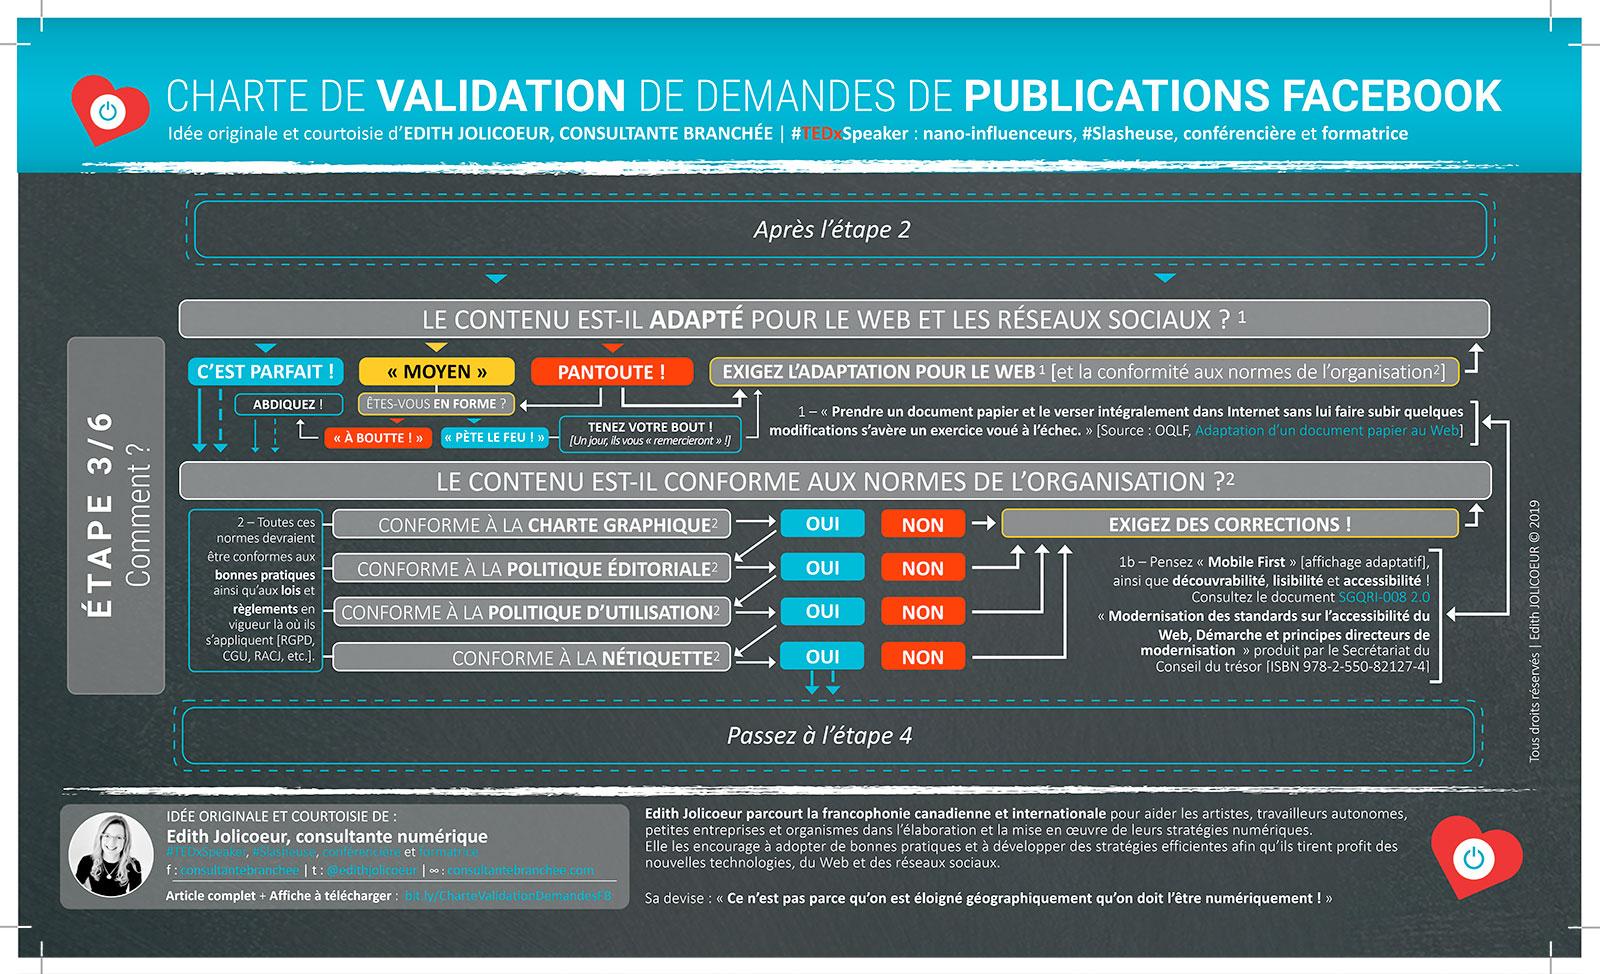 Étape 3 : CHARTE DE VALIDATION de demandes de publications Facebook | Edith JOLICOEUR, consultante branchée